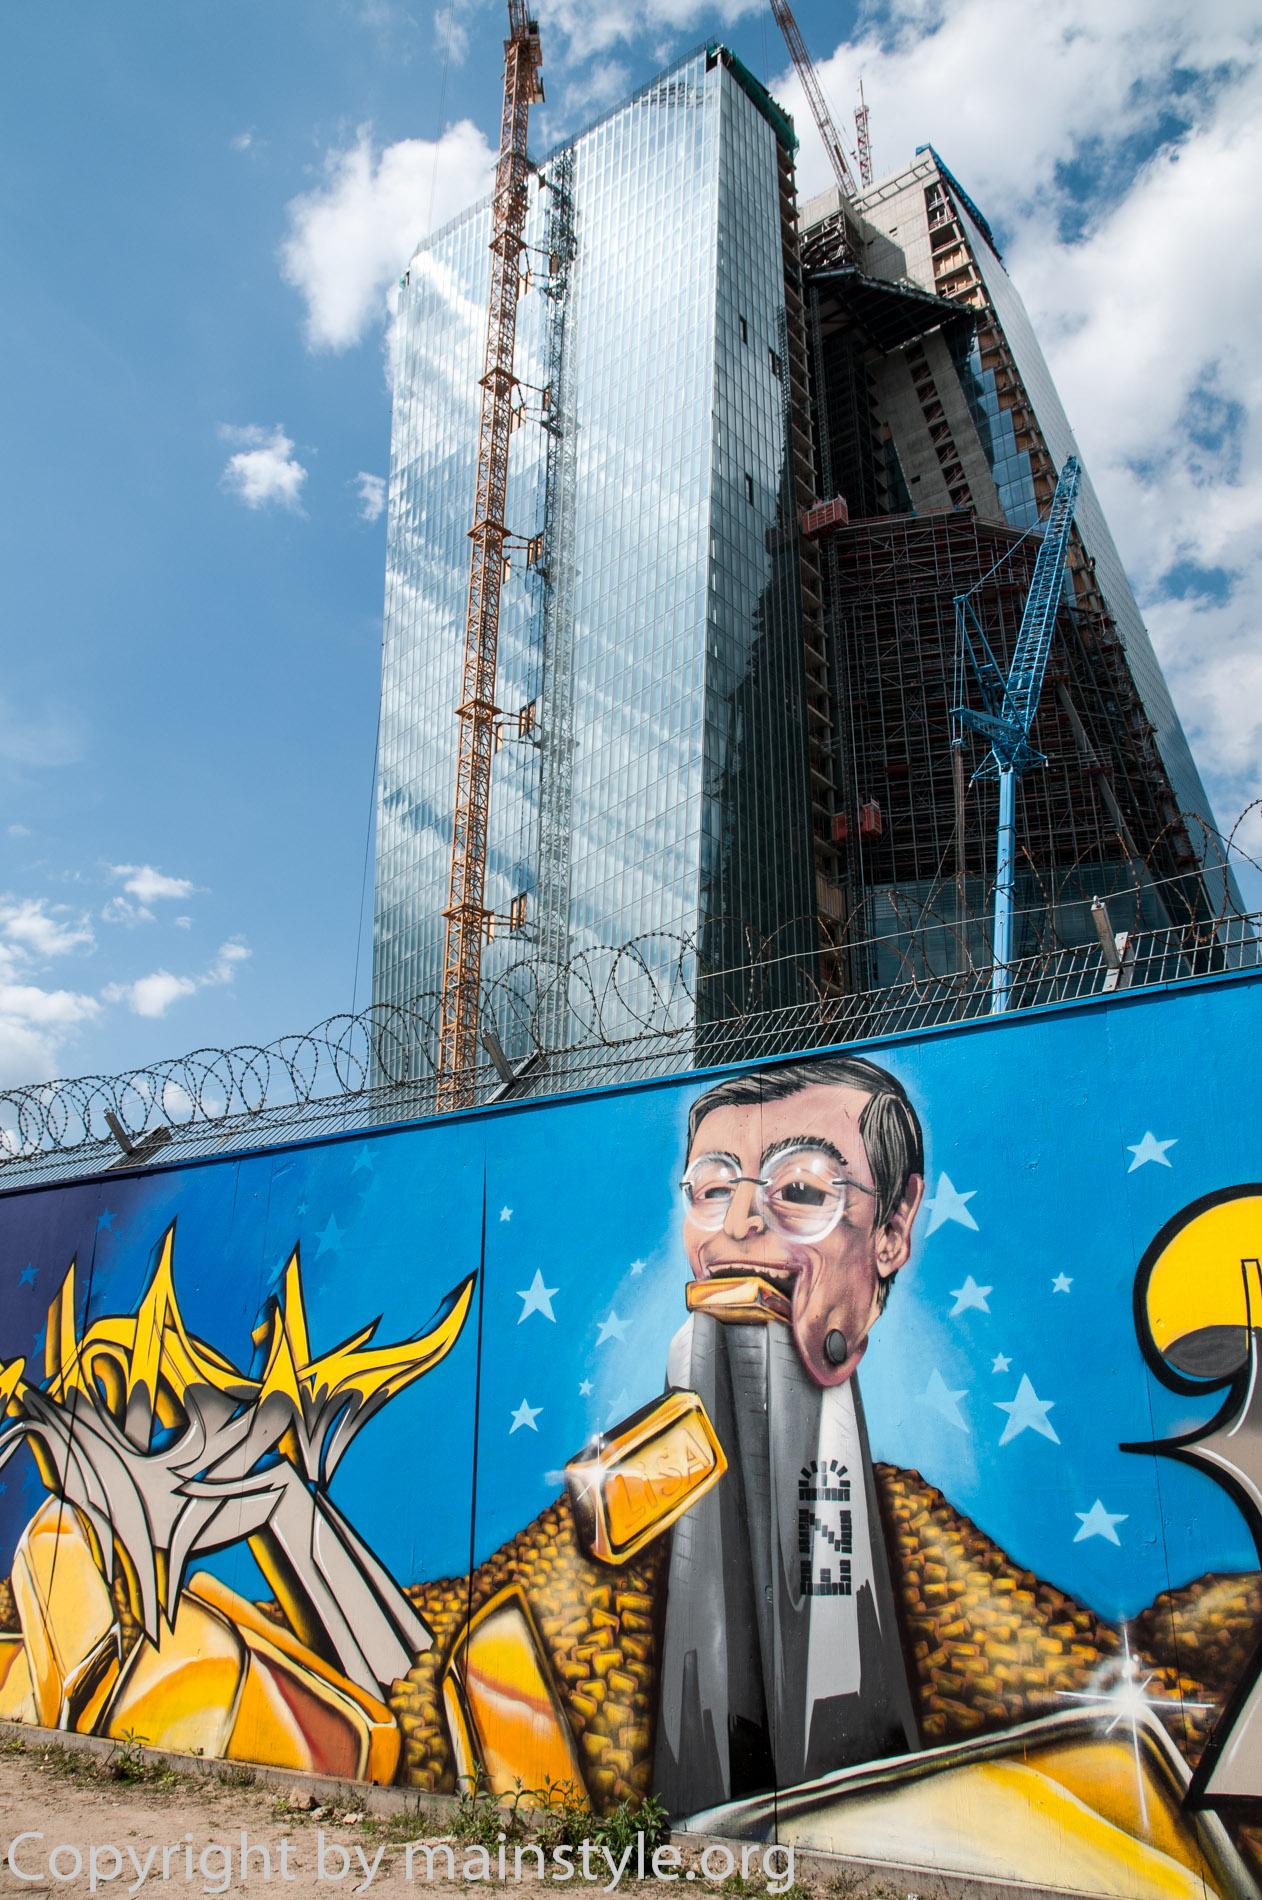 Frankfurt_Nacht_der_Museen_Graffiti_EZB_2013_Part3-6480